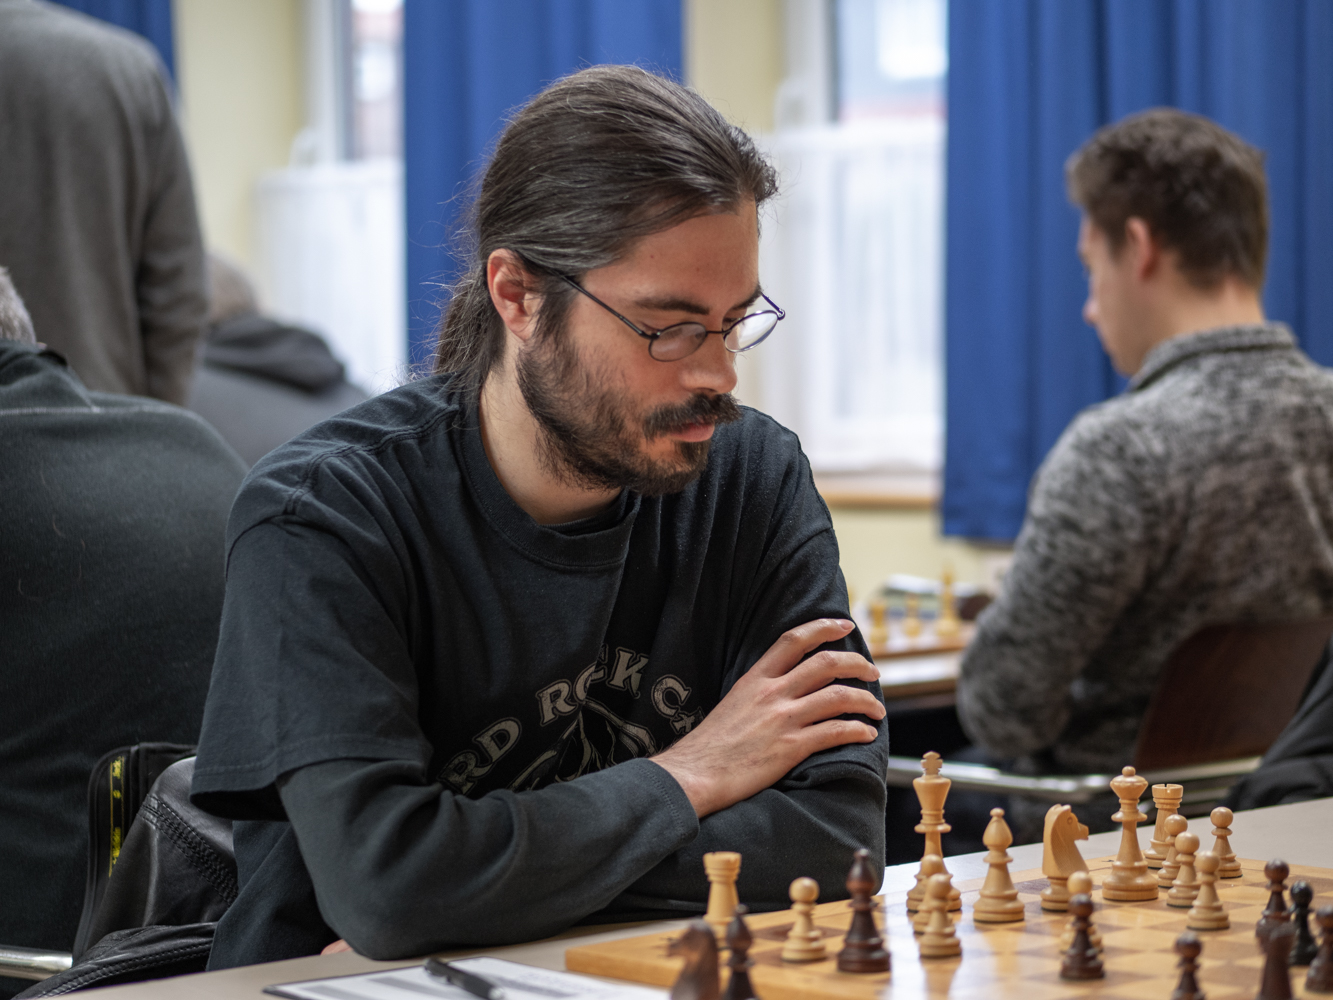 Matthias Stief